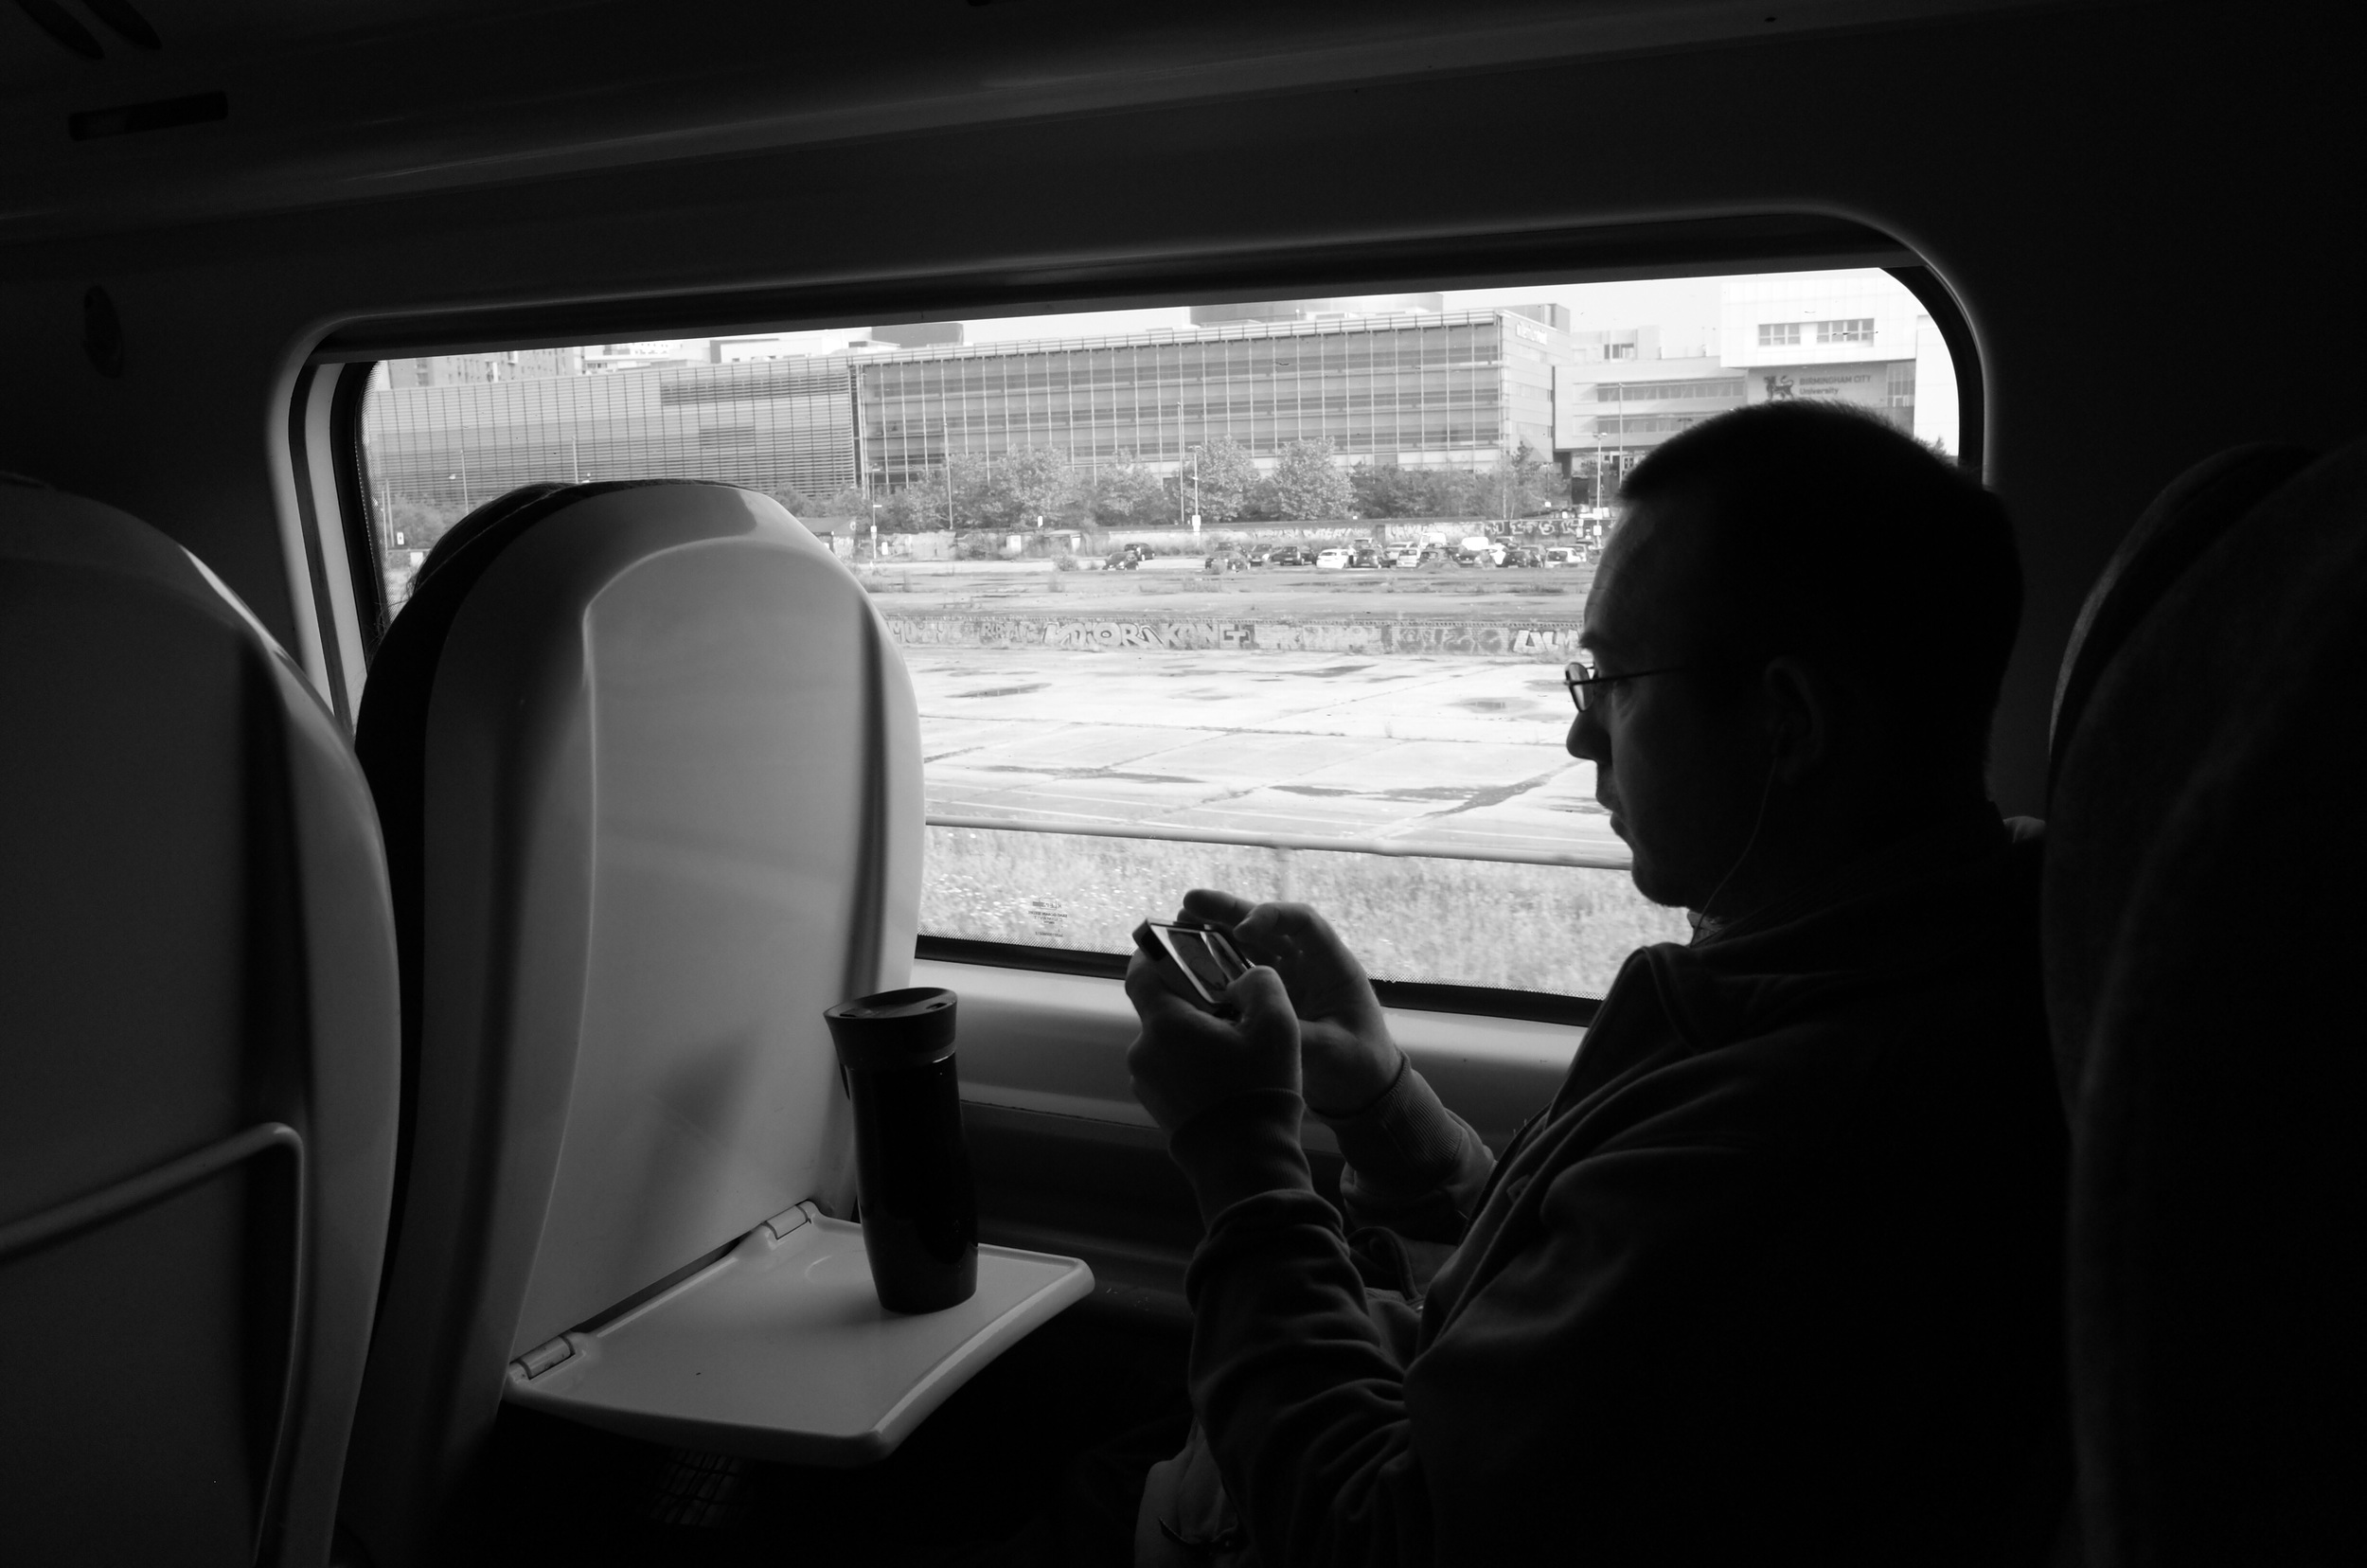 Virgin Trains - Clifford Darby 2016